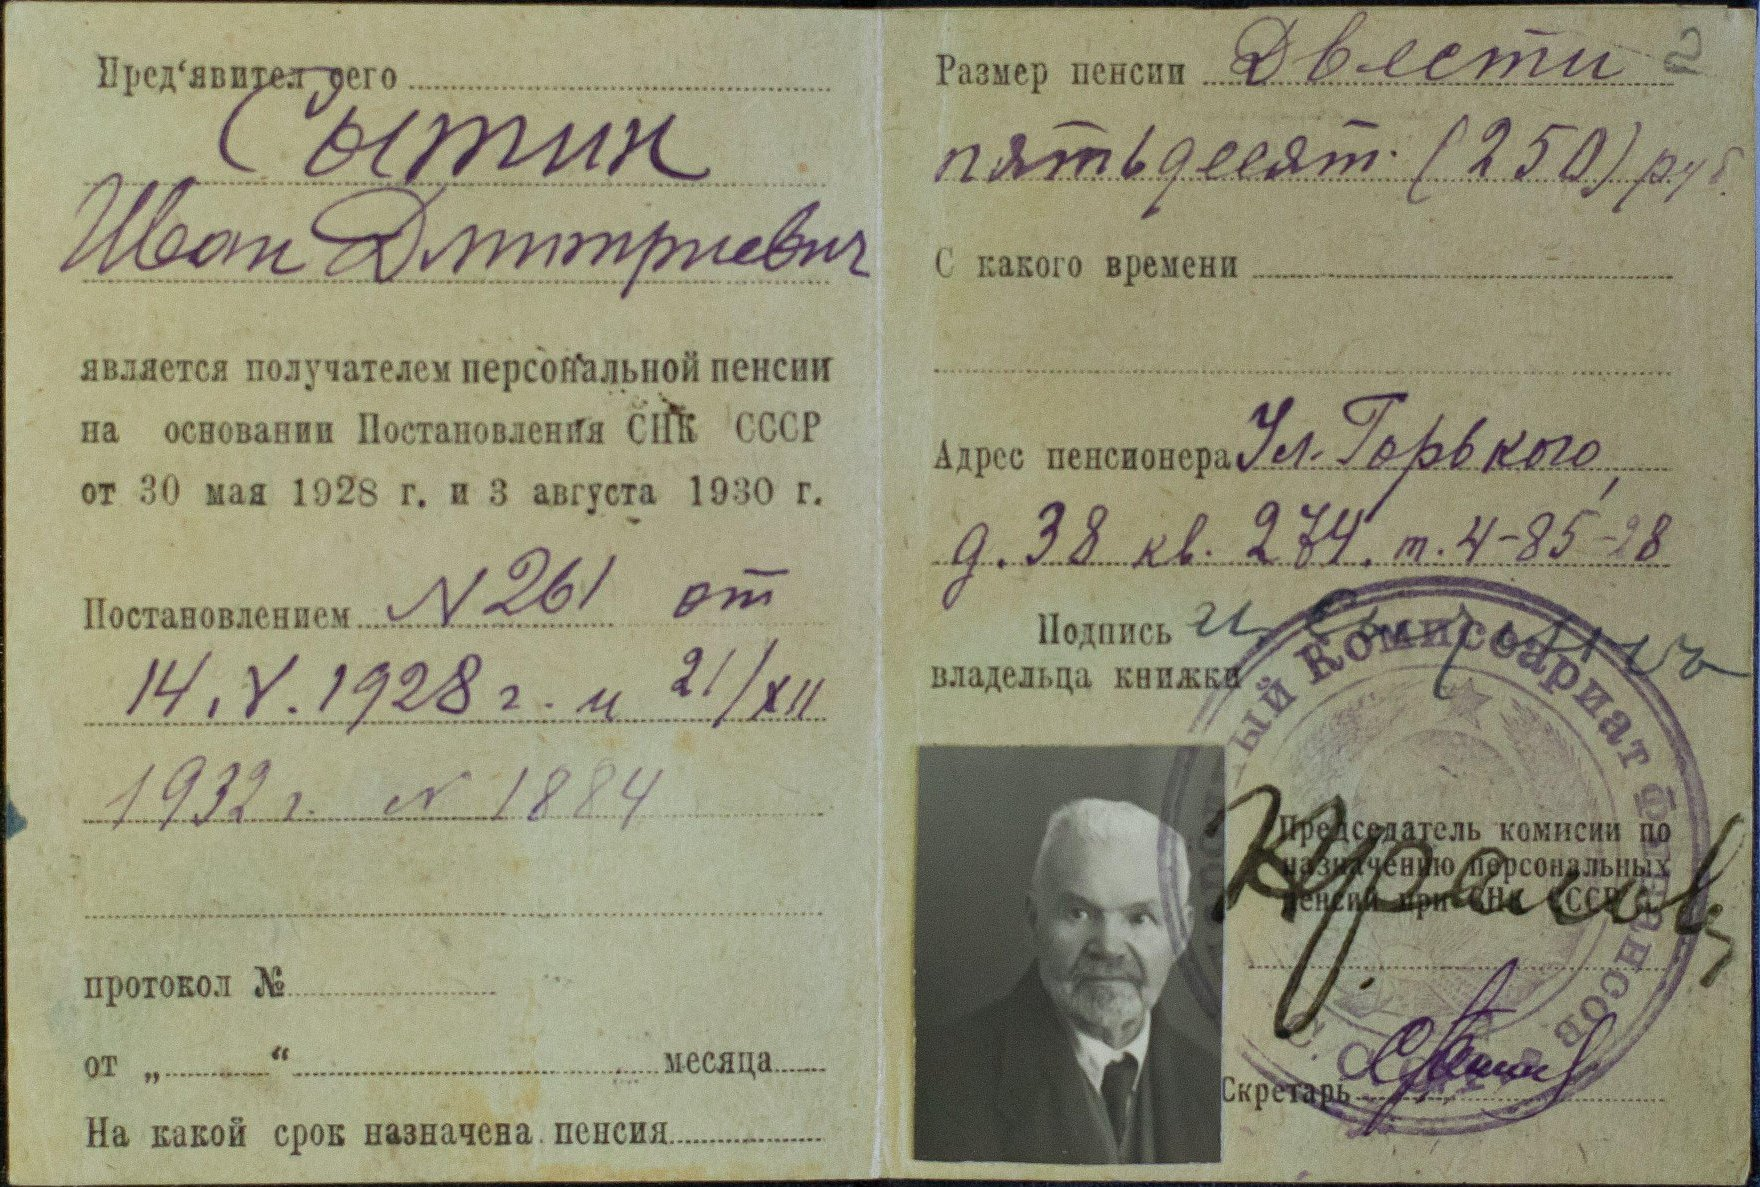 40. Пенсионная книжка И.Д.Сытина от 14 мая 1928 г. Установлена пенсия 250 руб. в месяц.1